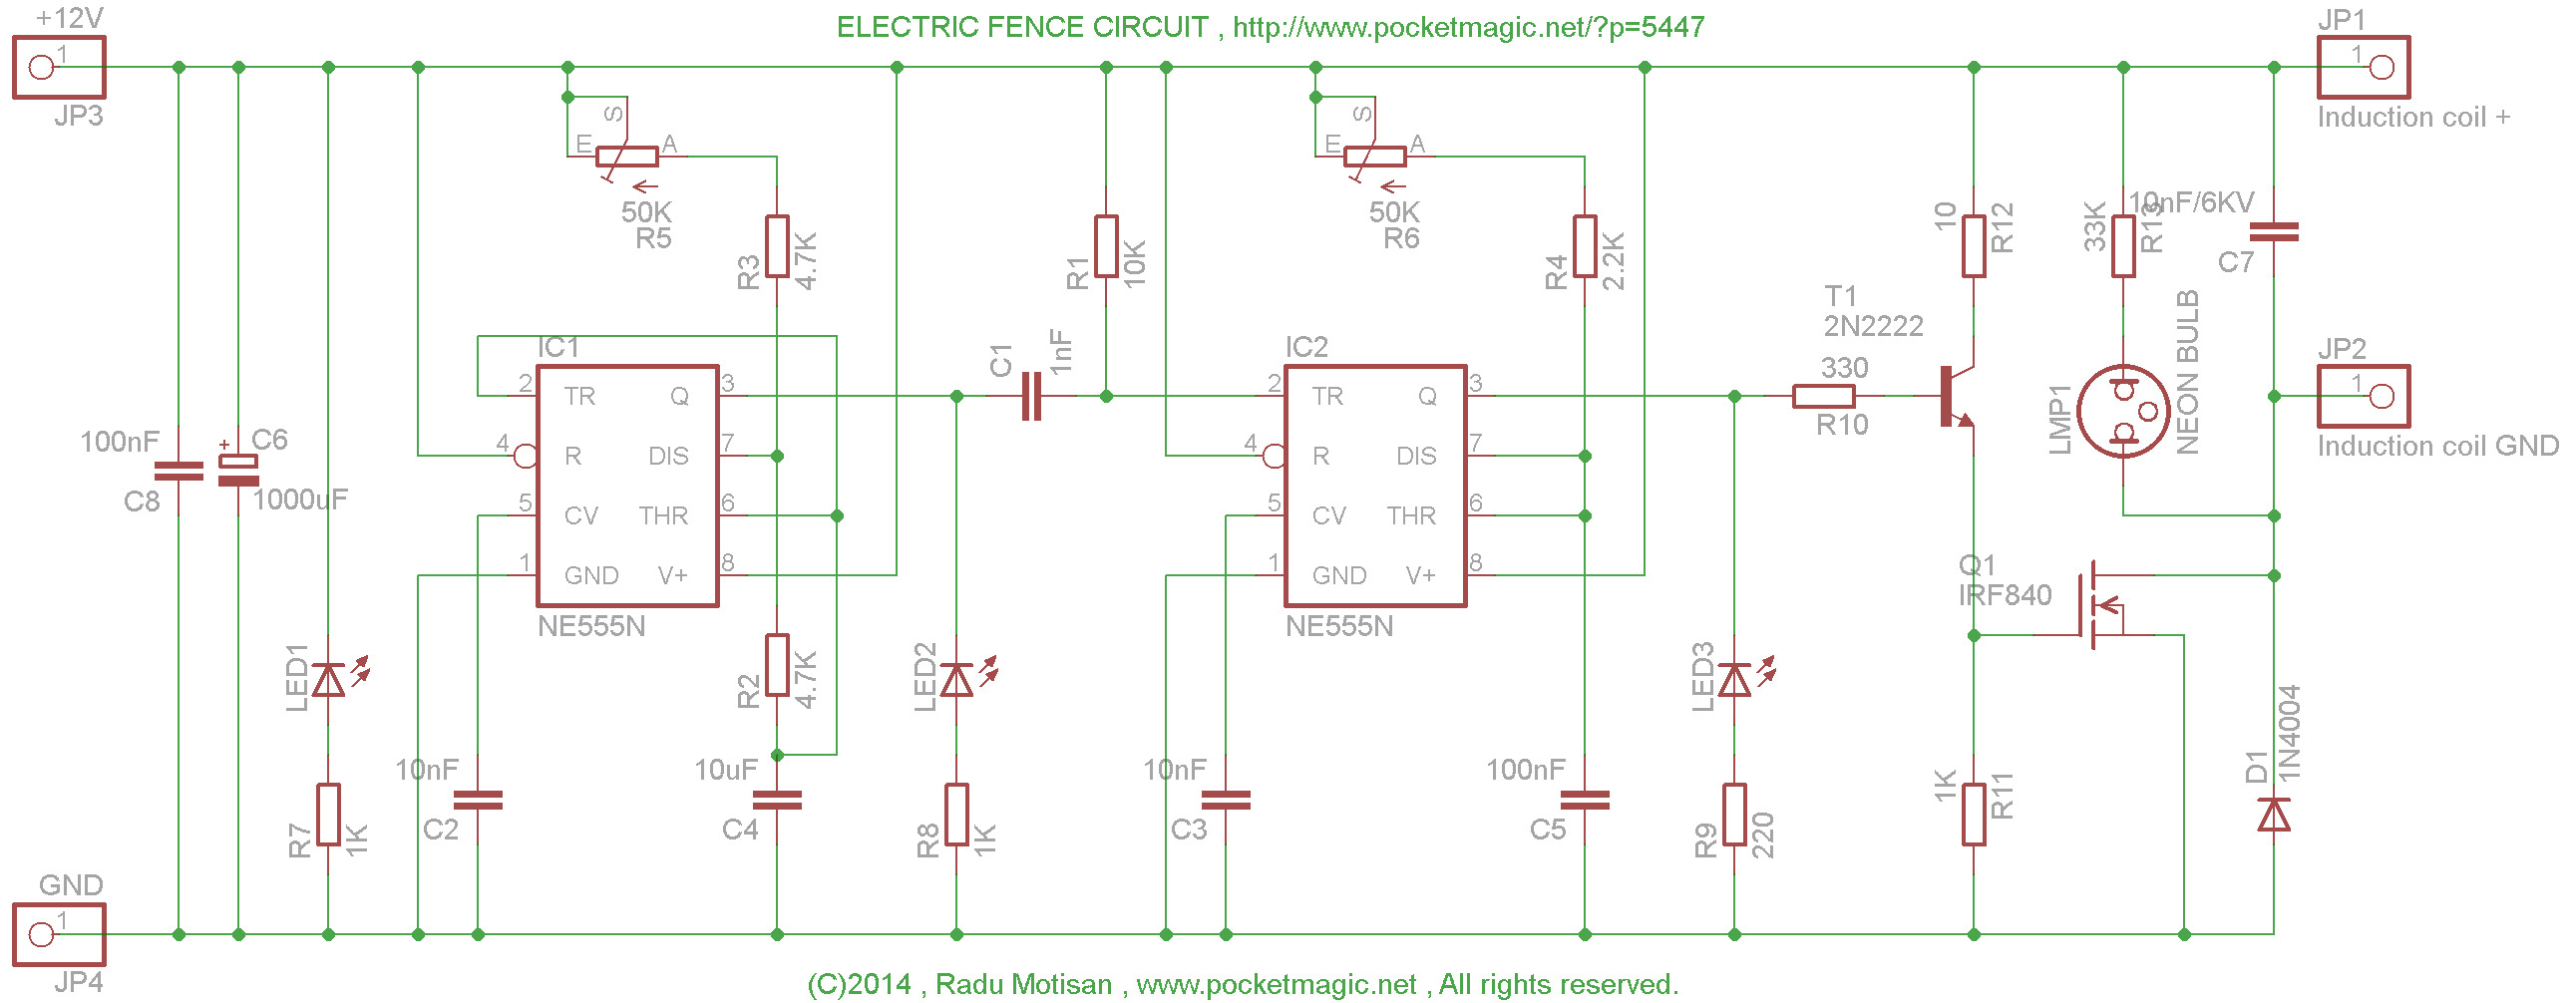 Diy Electric Fence Fresh Electric Fence Wiring Diagram Sample – Web - Electric Fence Wiring Diagram